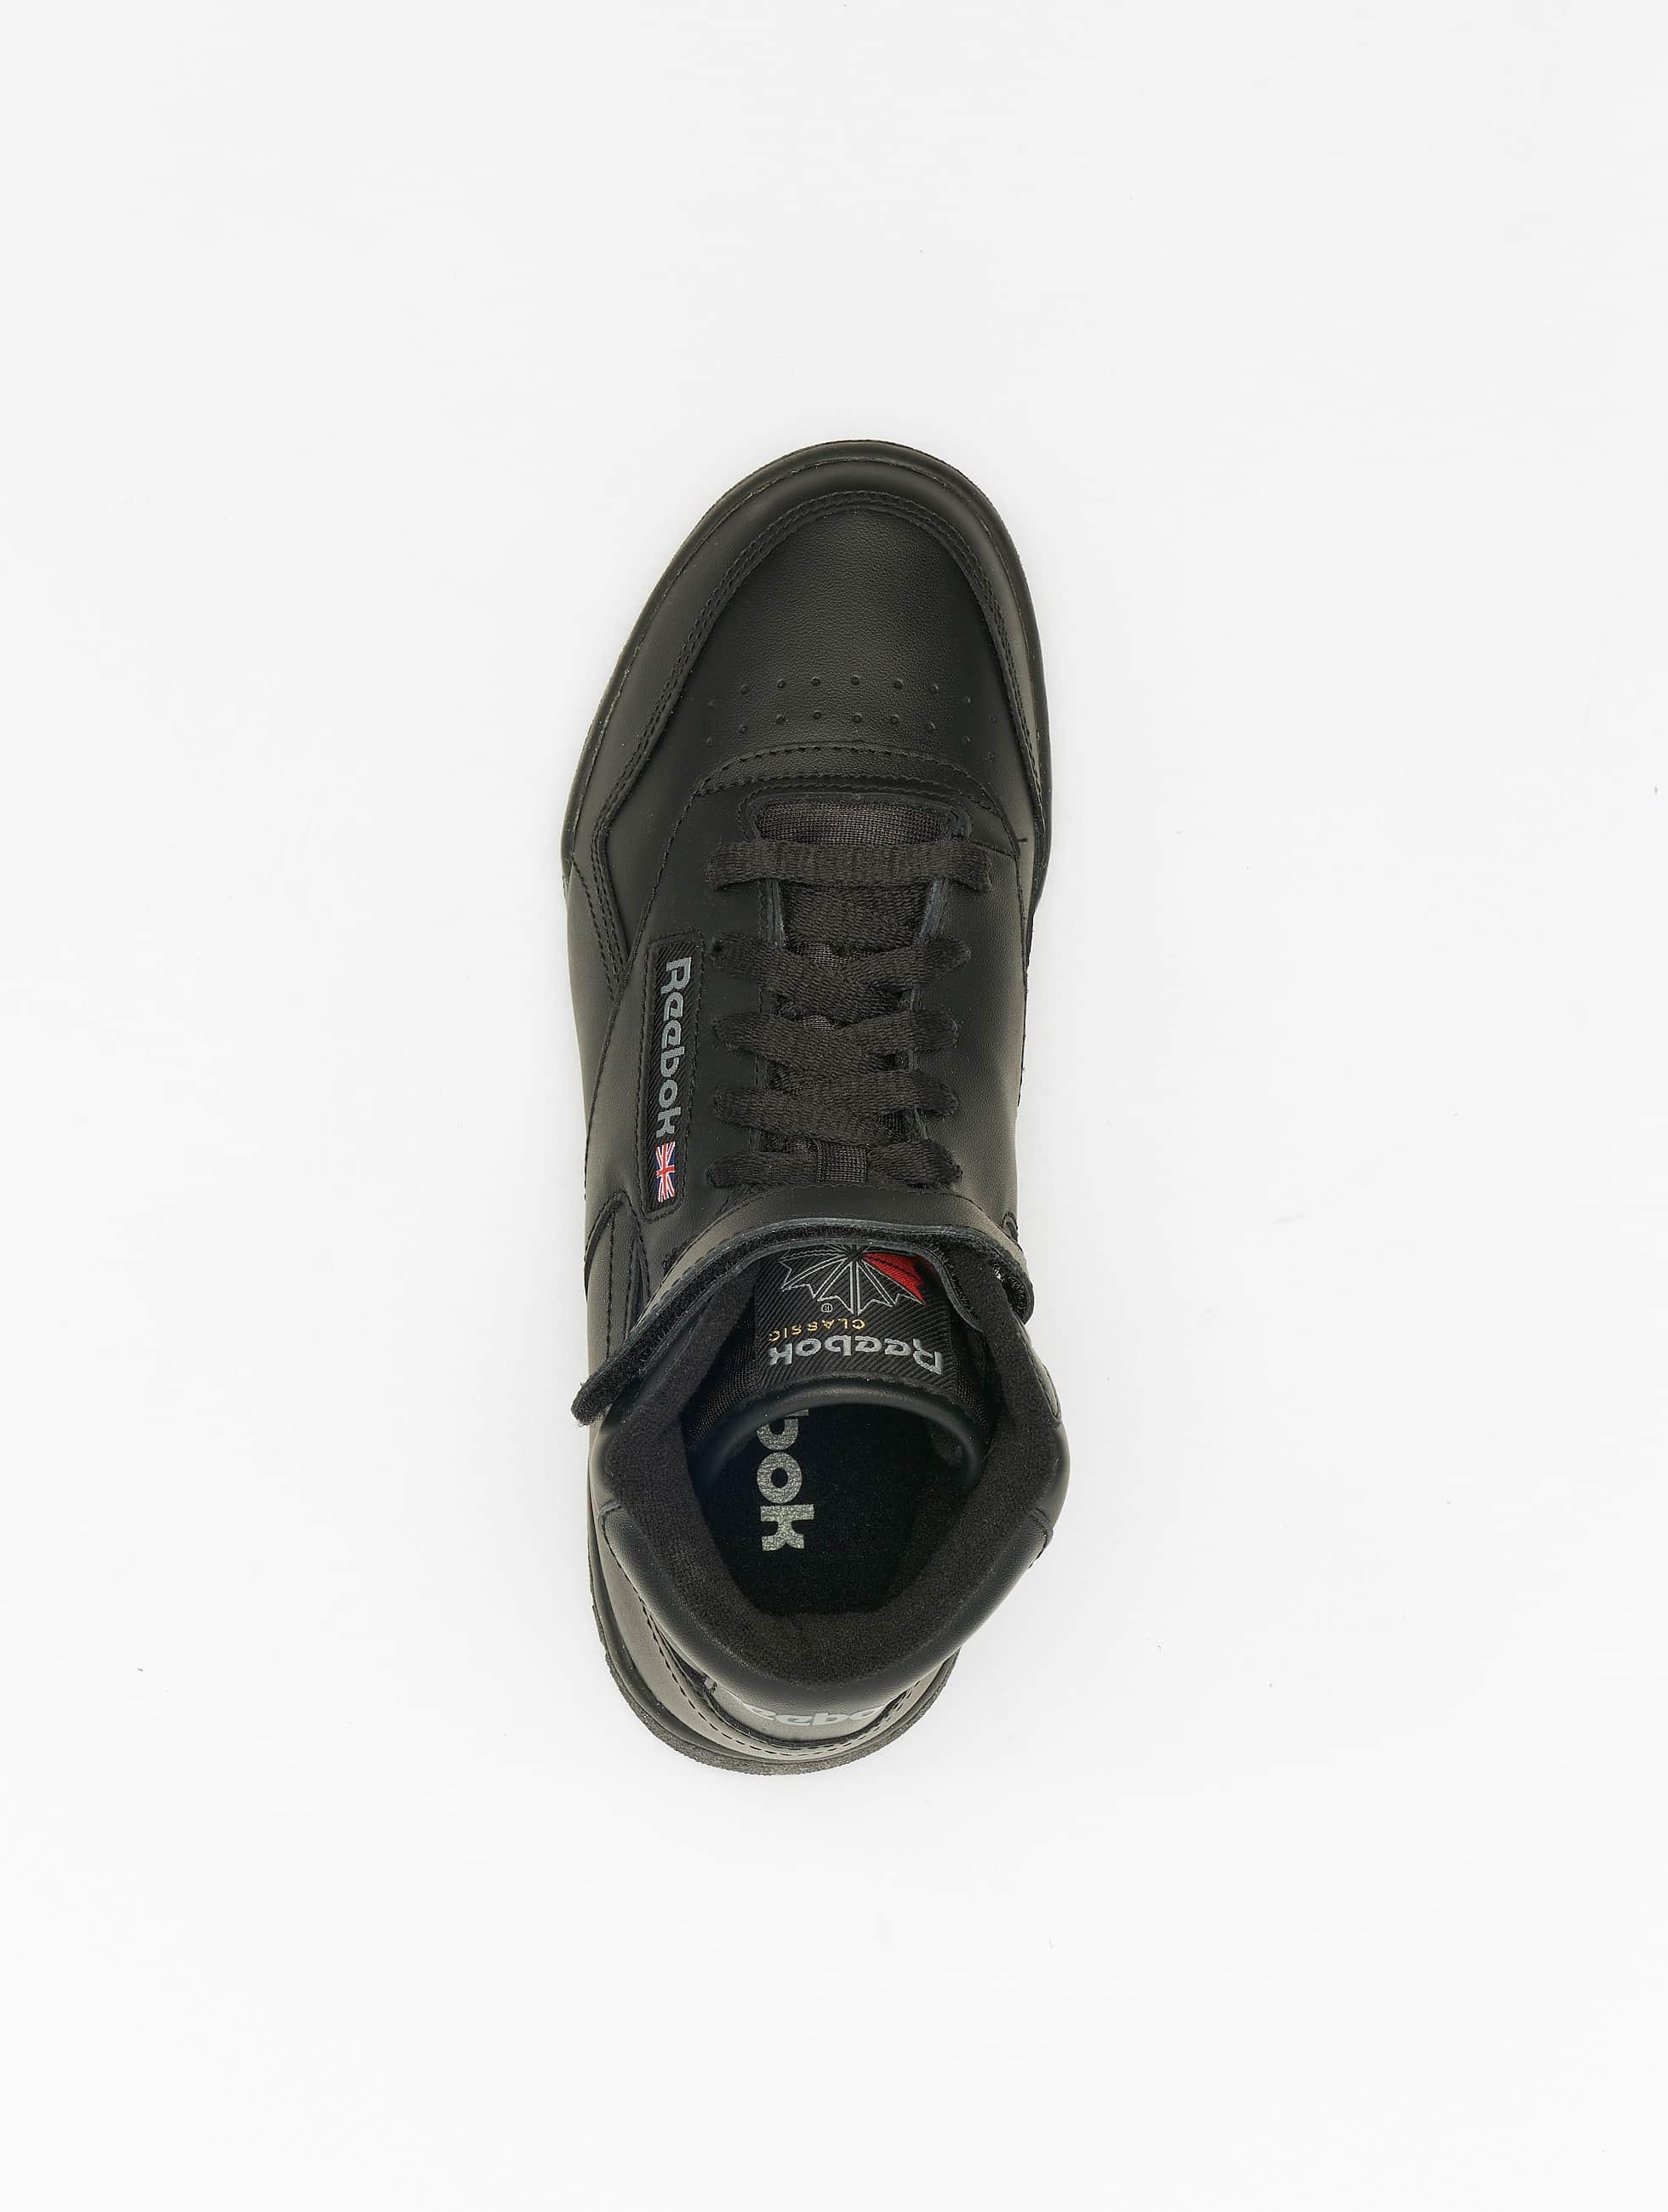 Reebok Sneakers Exofit Hi Basketball Shoes black